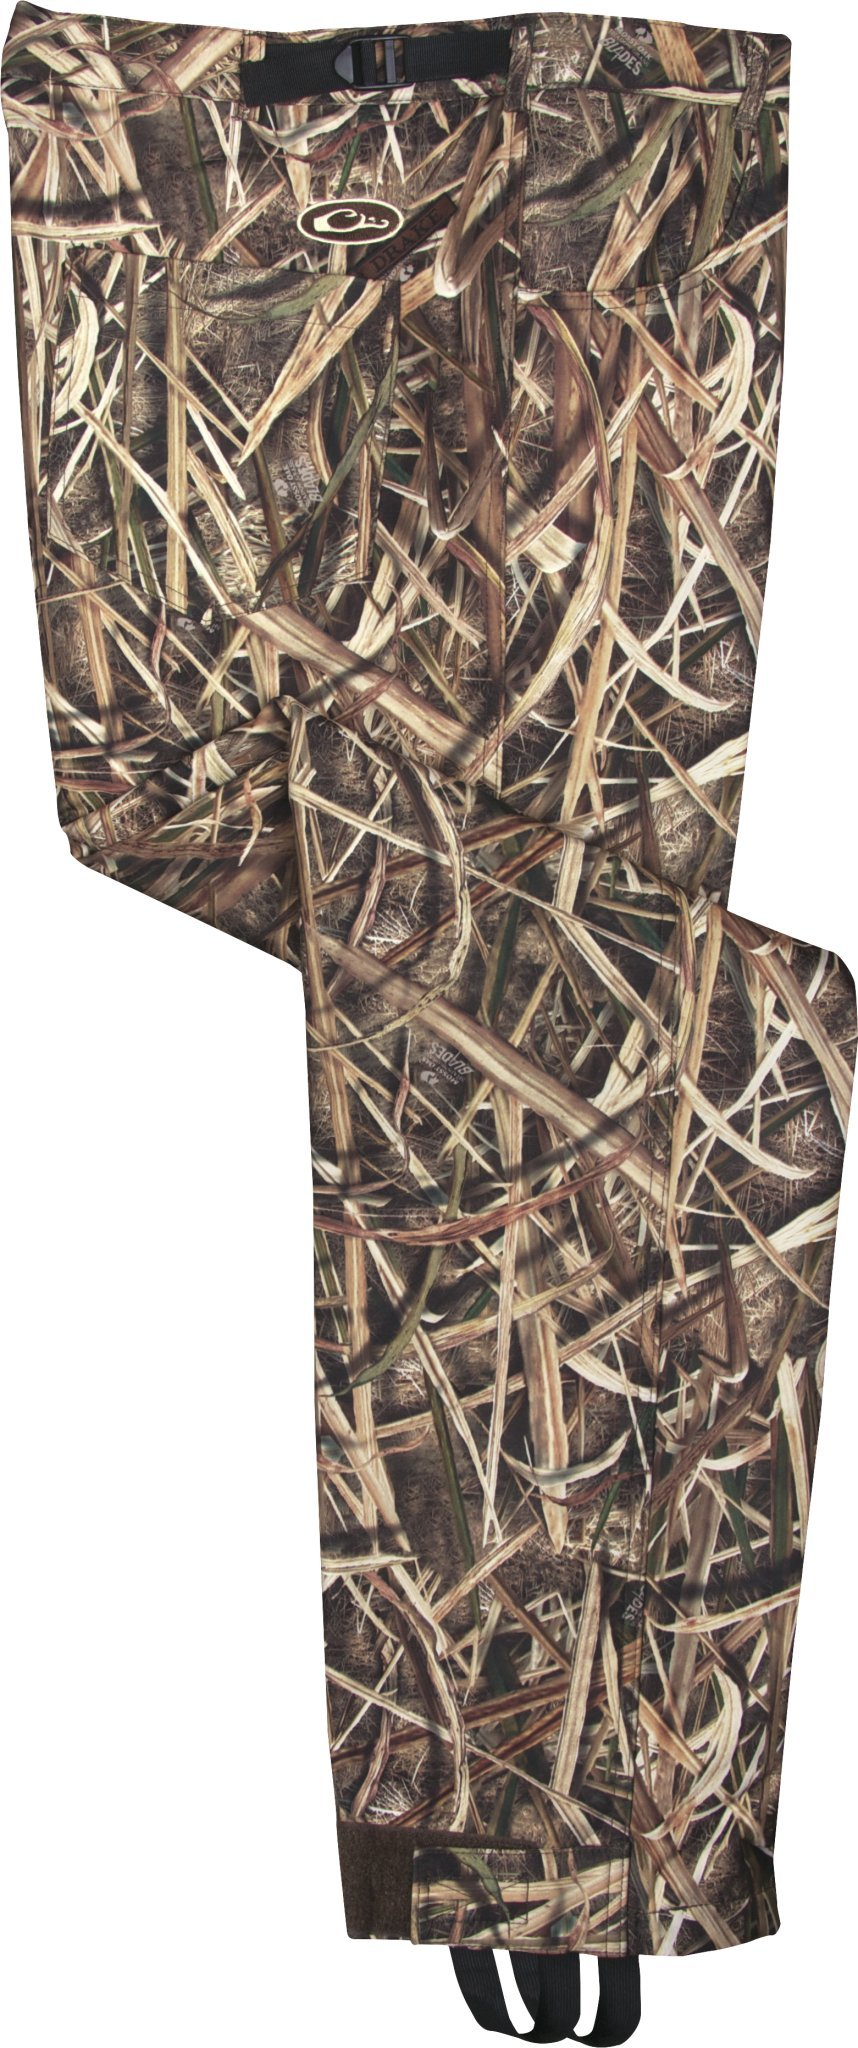 Drake MST Windproof Bonded Fleece Pant, Color: Blades, Size: Large (DW2440-013-3), Camo